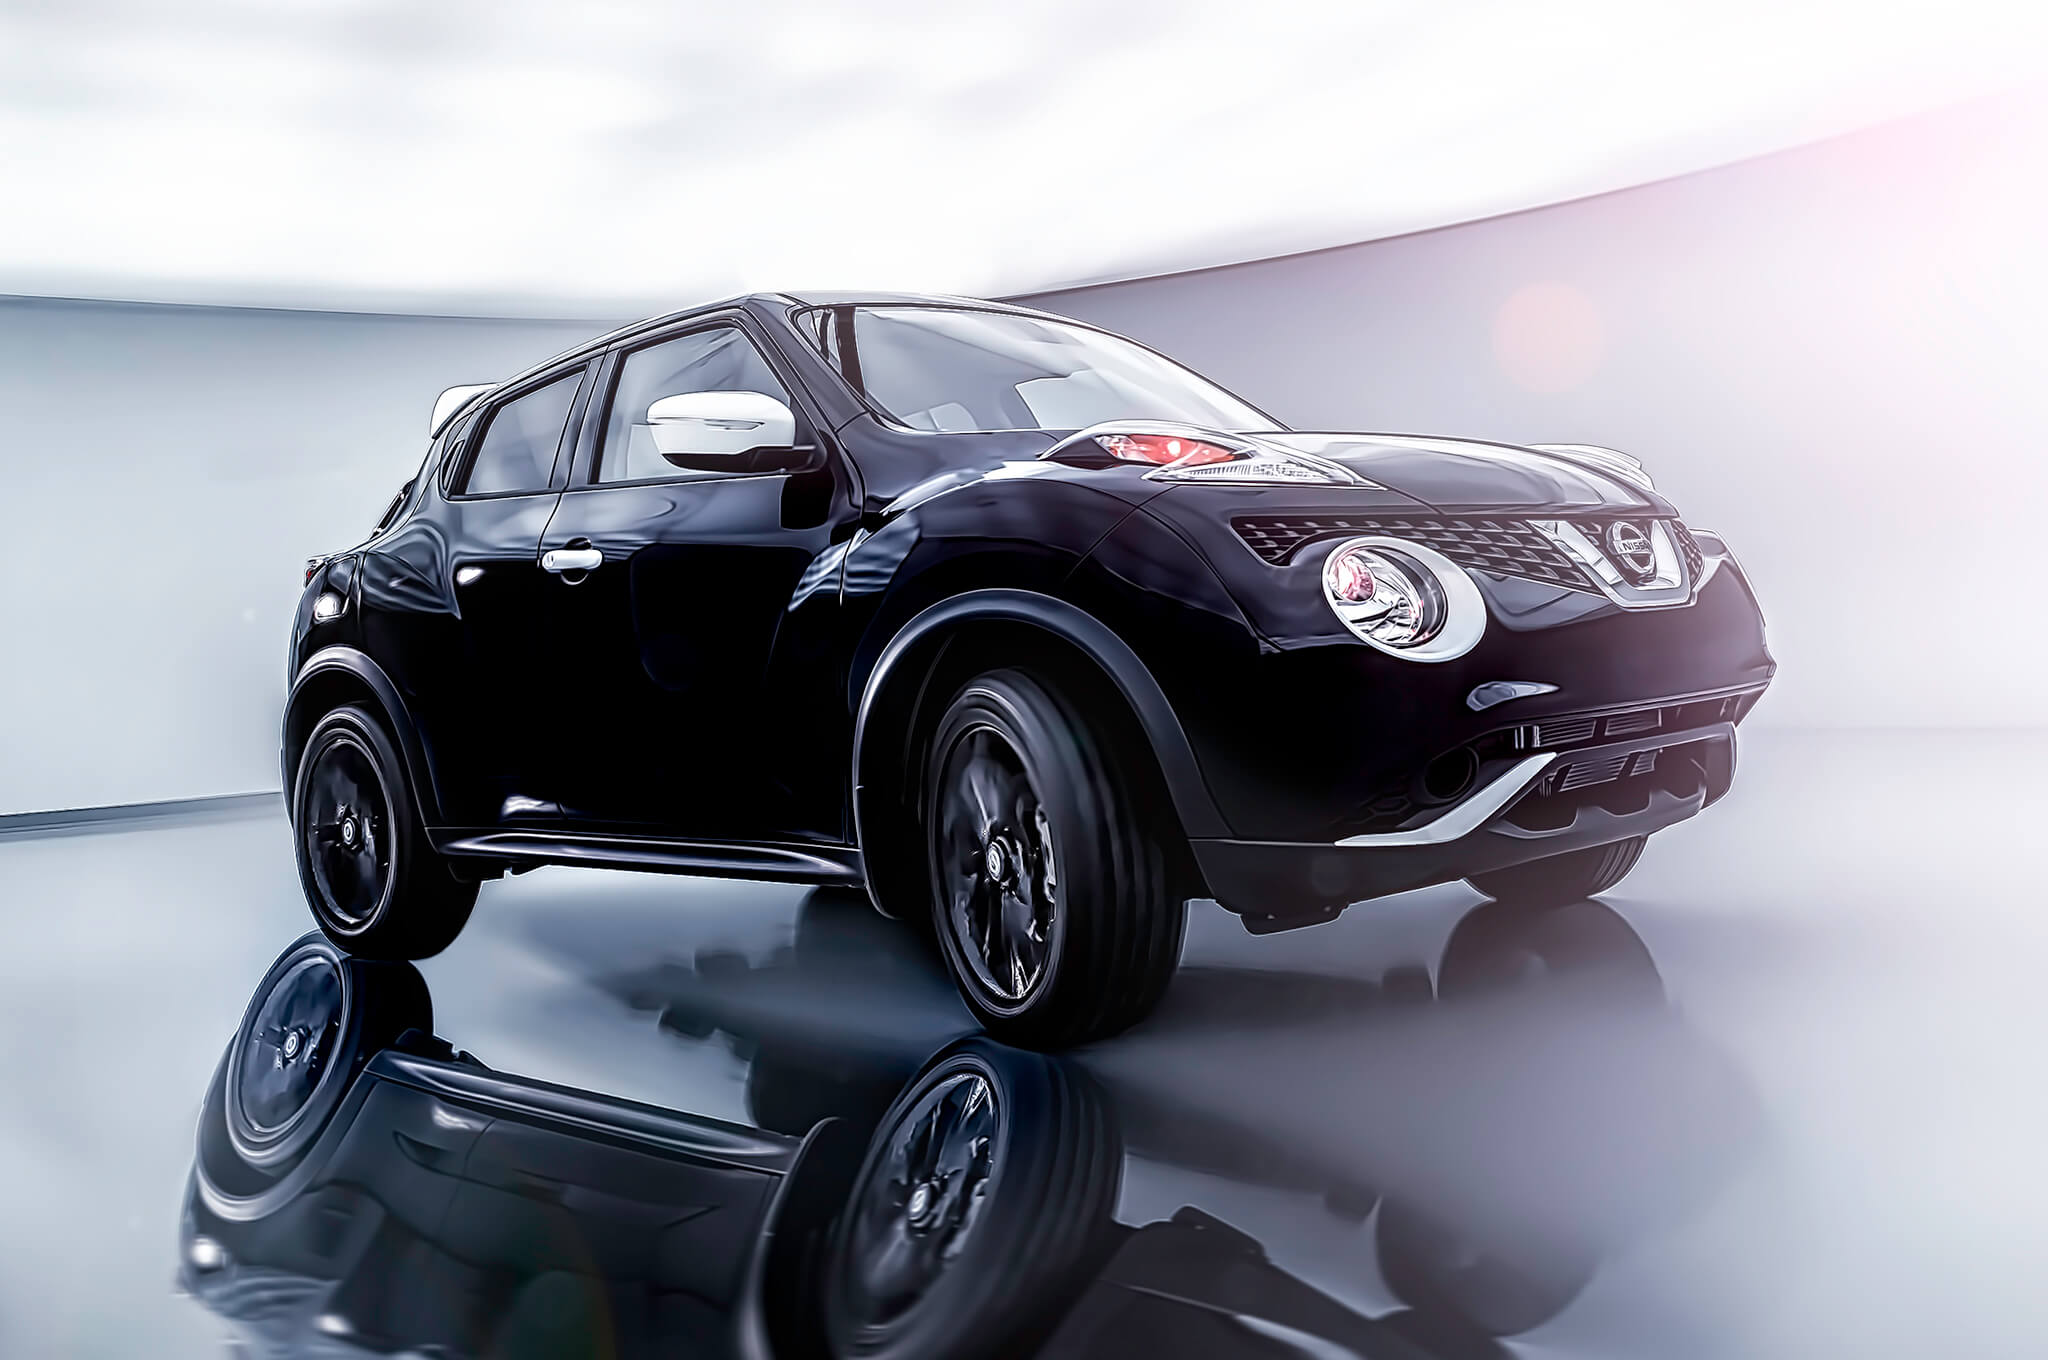 2017-Nissan-Juke-Black-Pearl-Edition-front-three-quarter